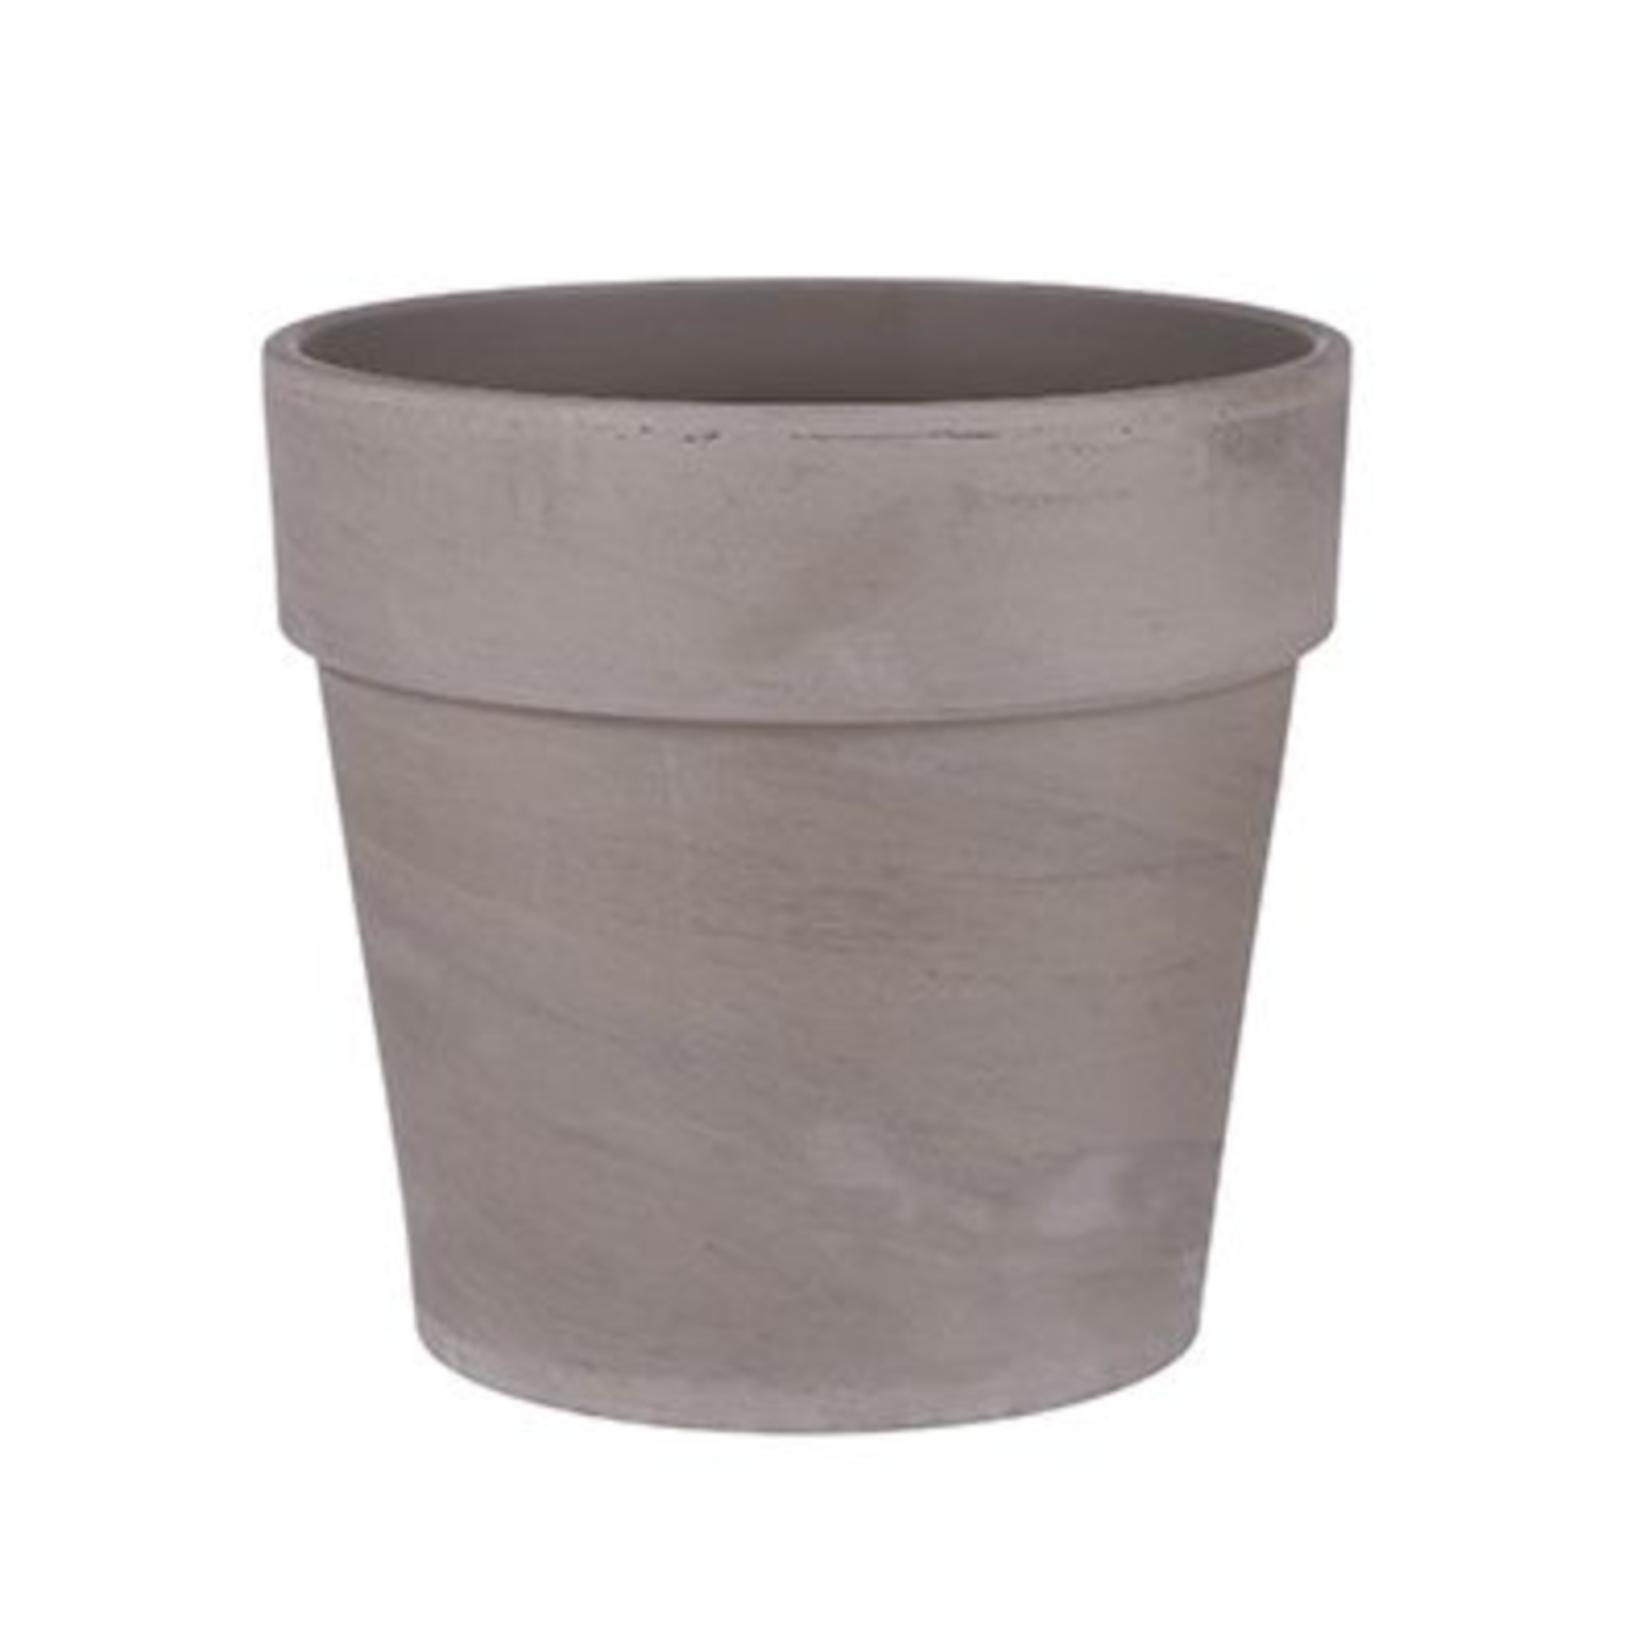 Edelman Carina grijs basalt ∅ 21cm